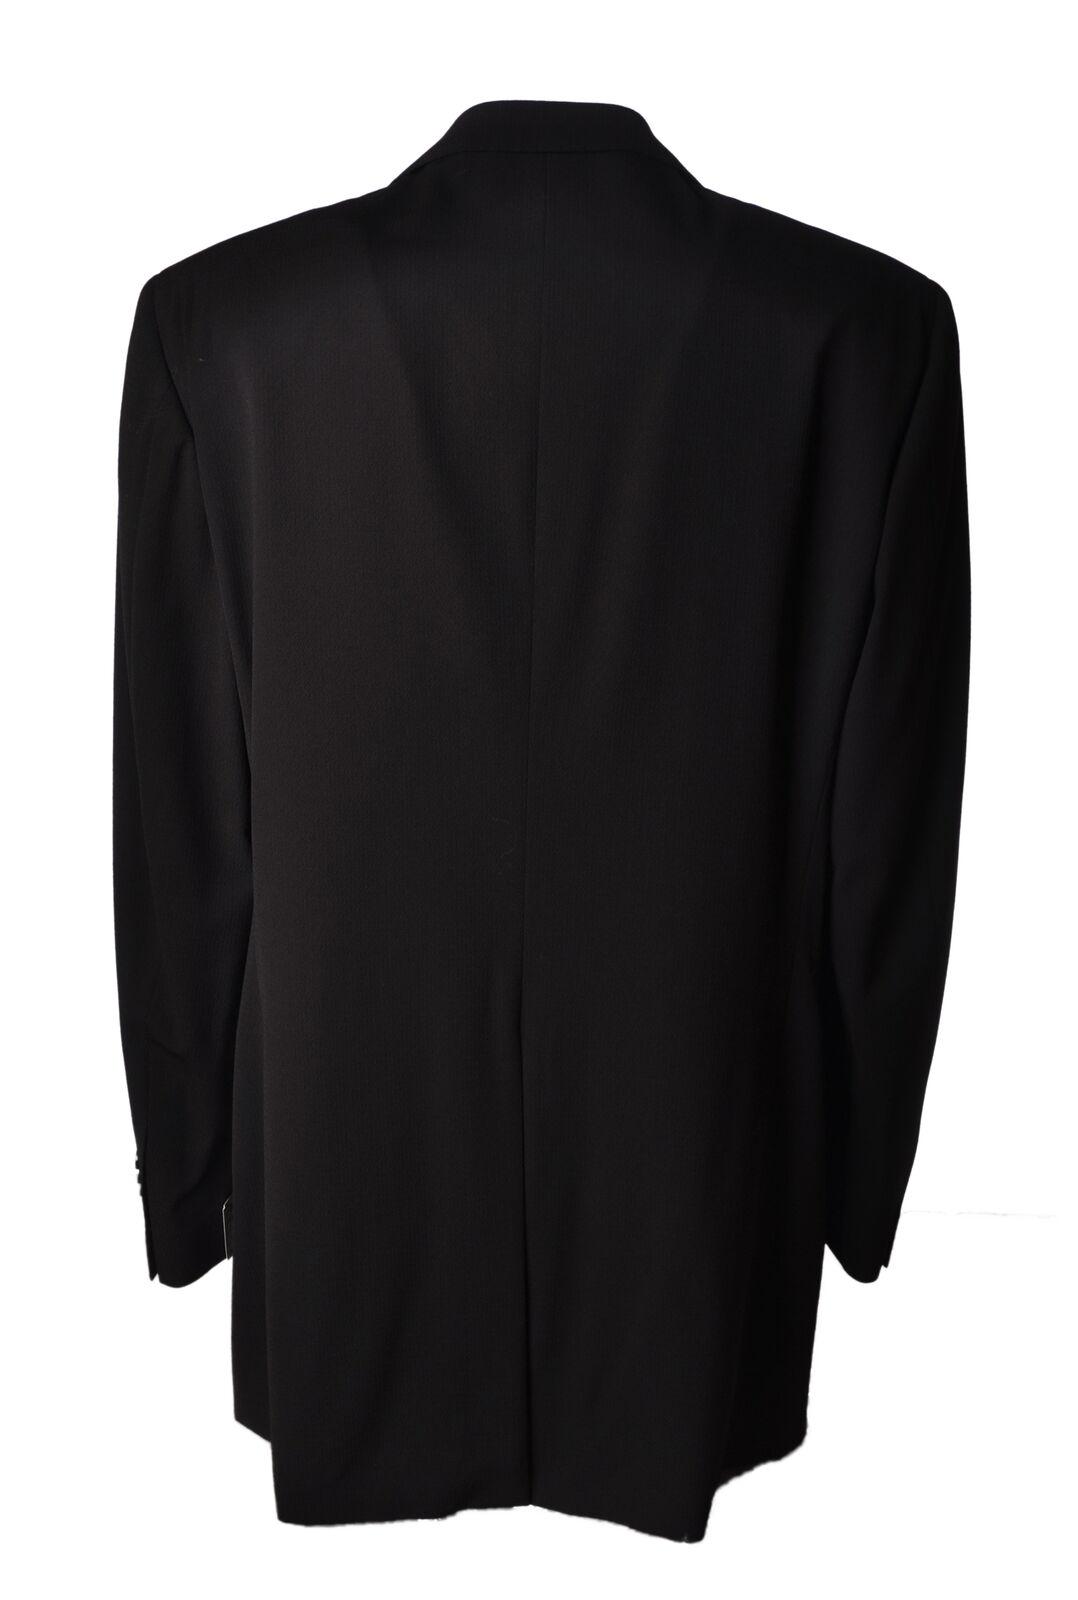 Corneliani Trend  -  Longueur - - Mâle - - Noir - 4715512A183736 0bafd5